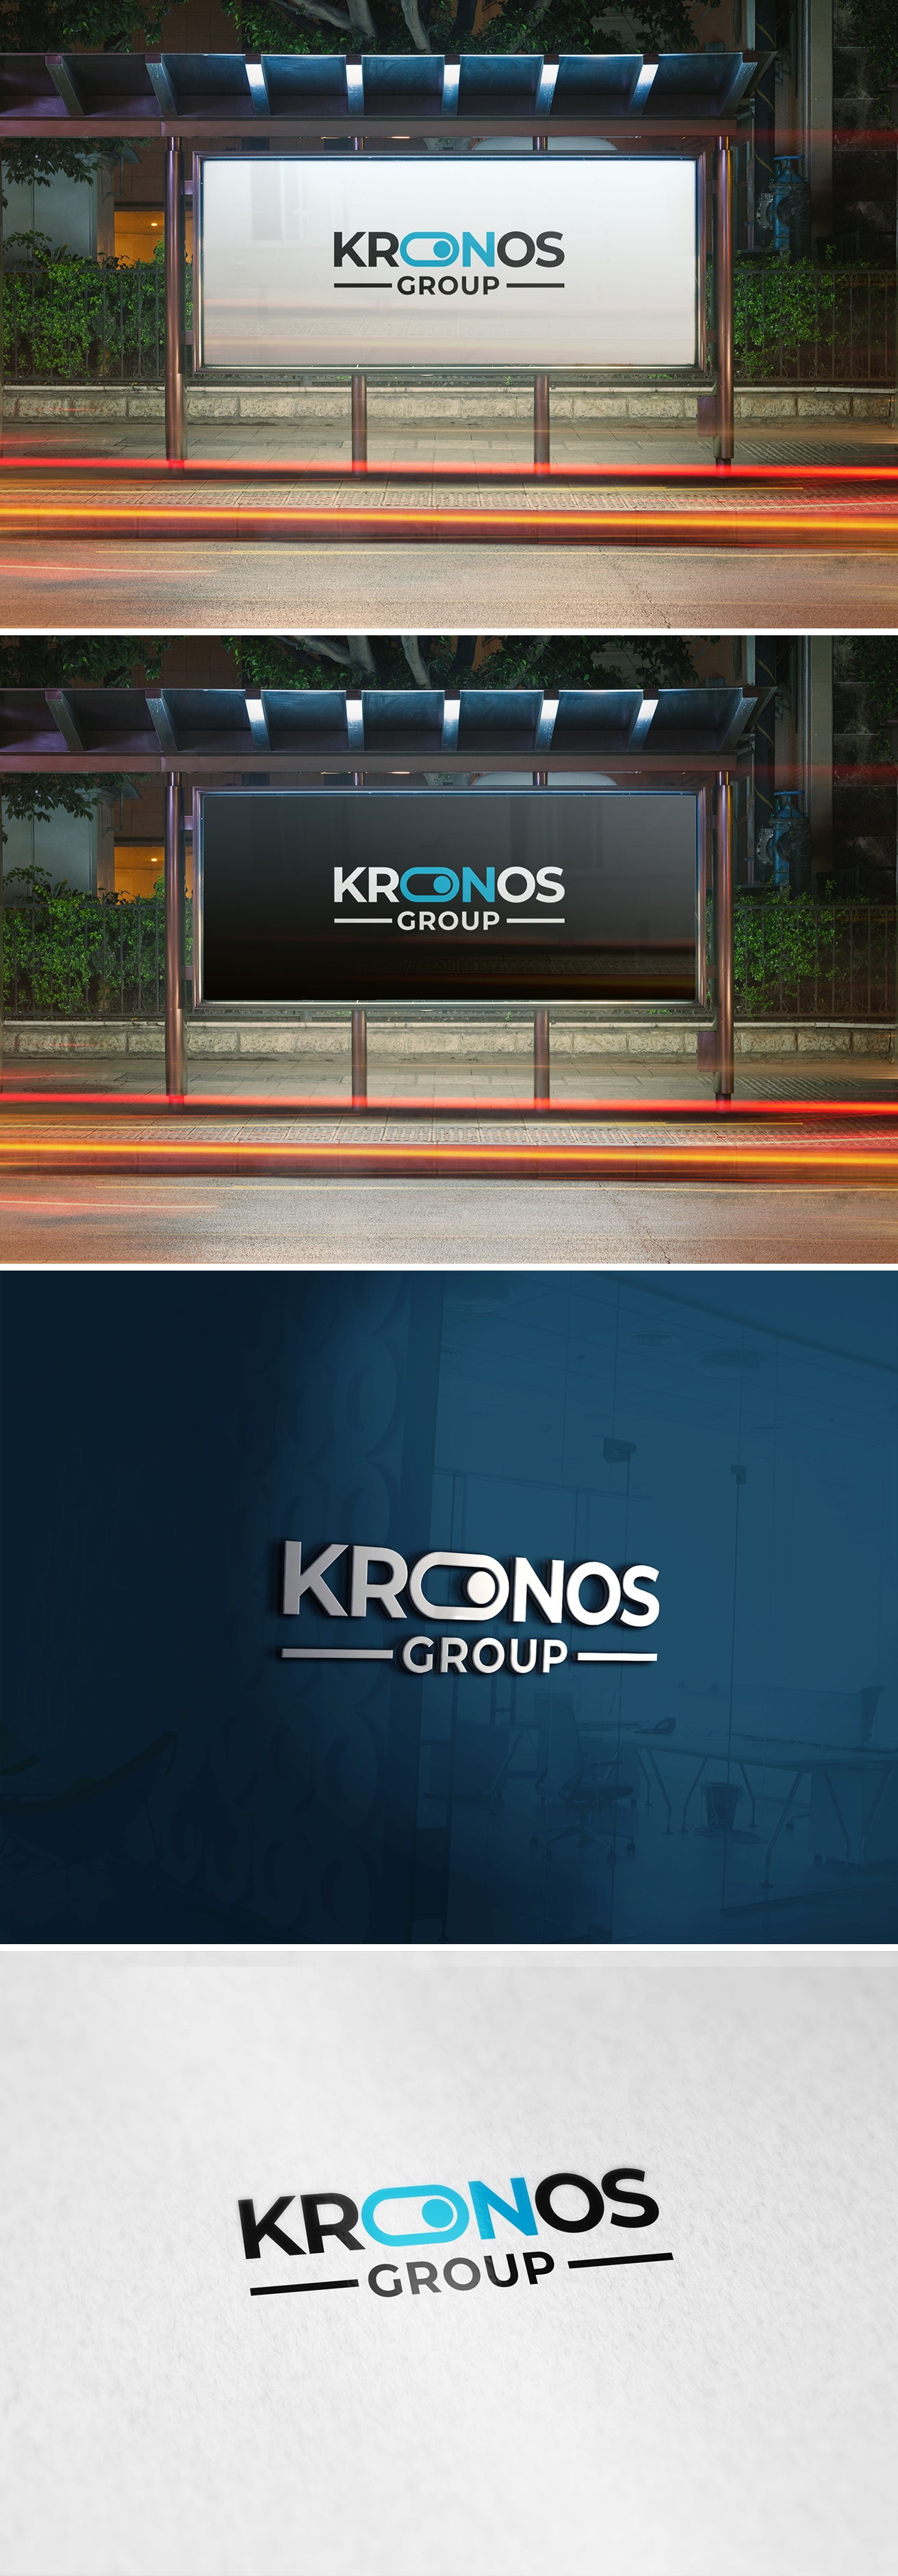 Разработать логотип KRONOS фото f_4195fafe587ebdcd.jpg